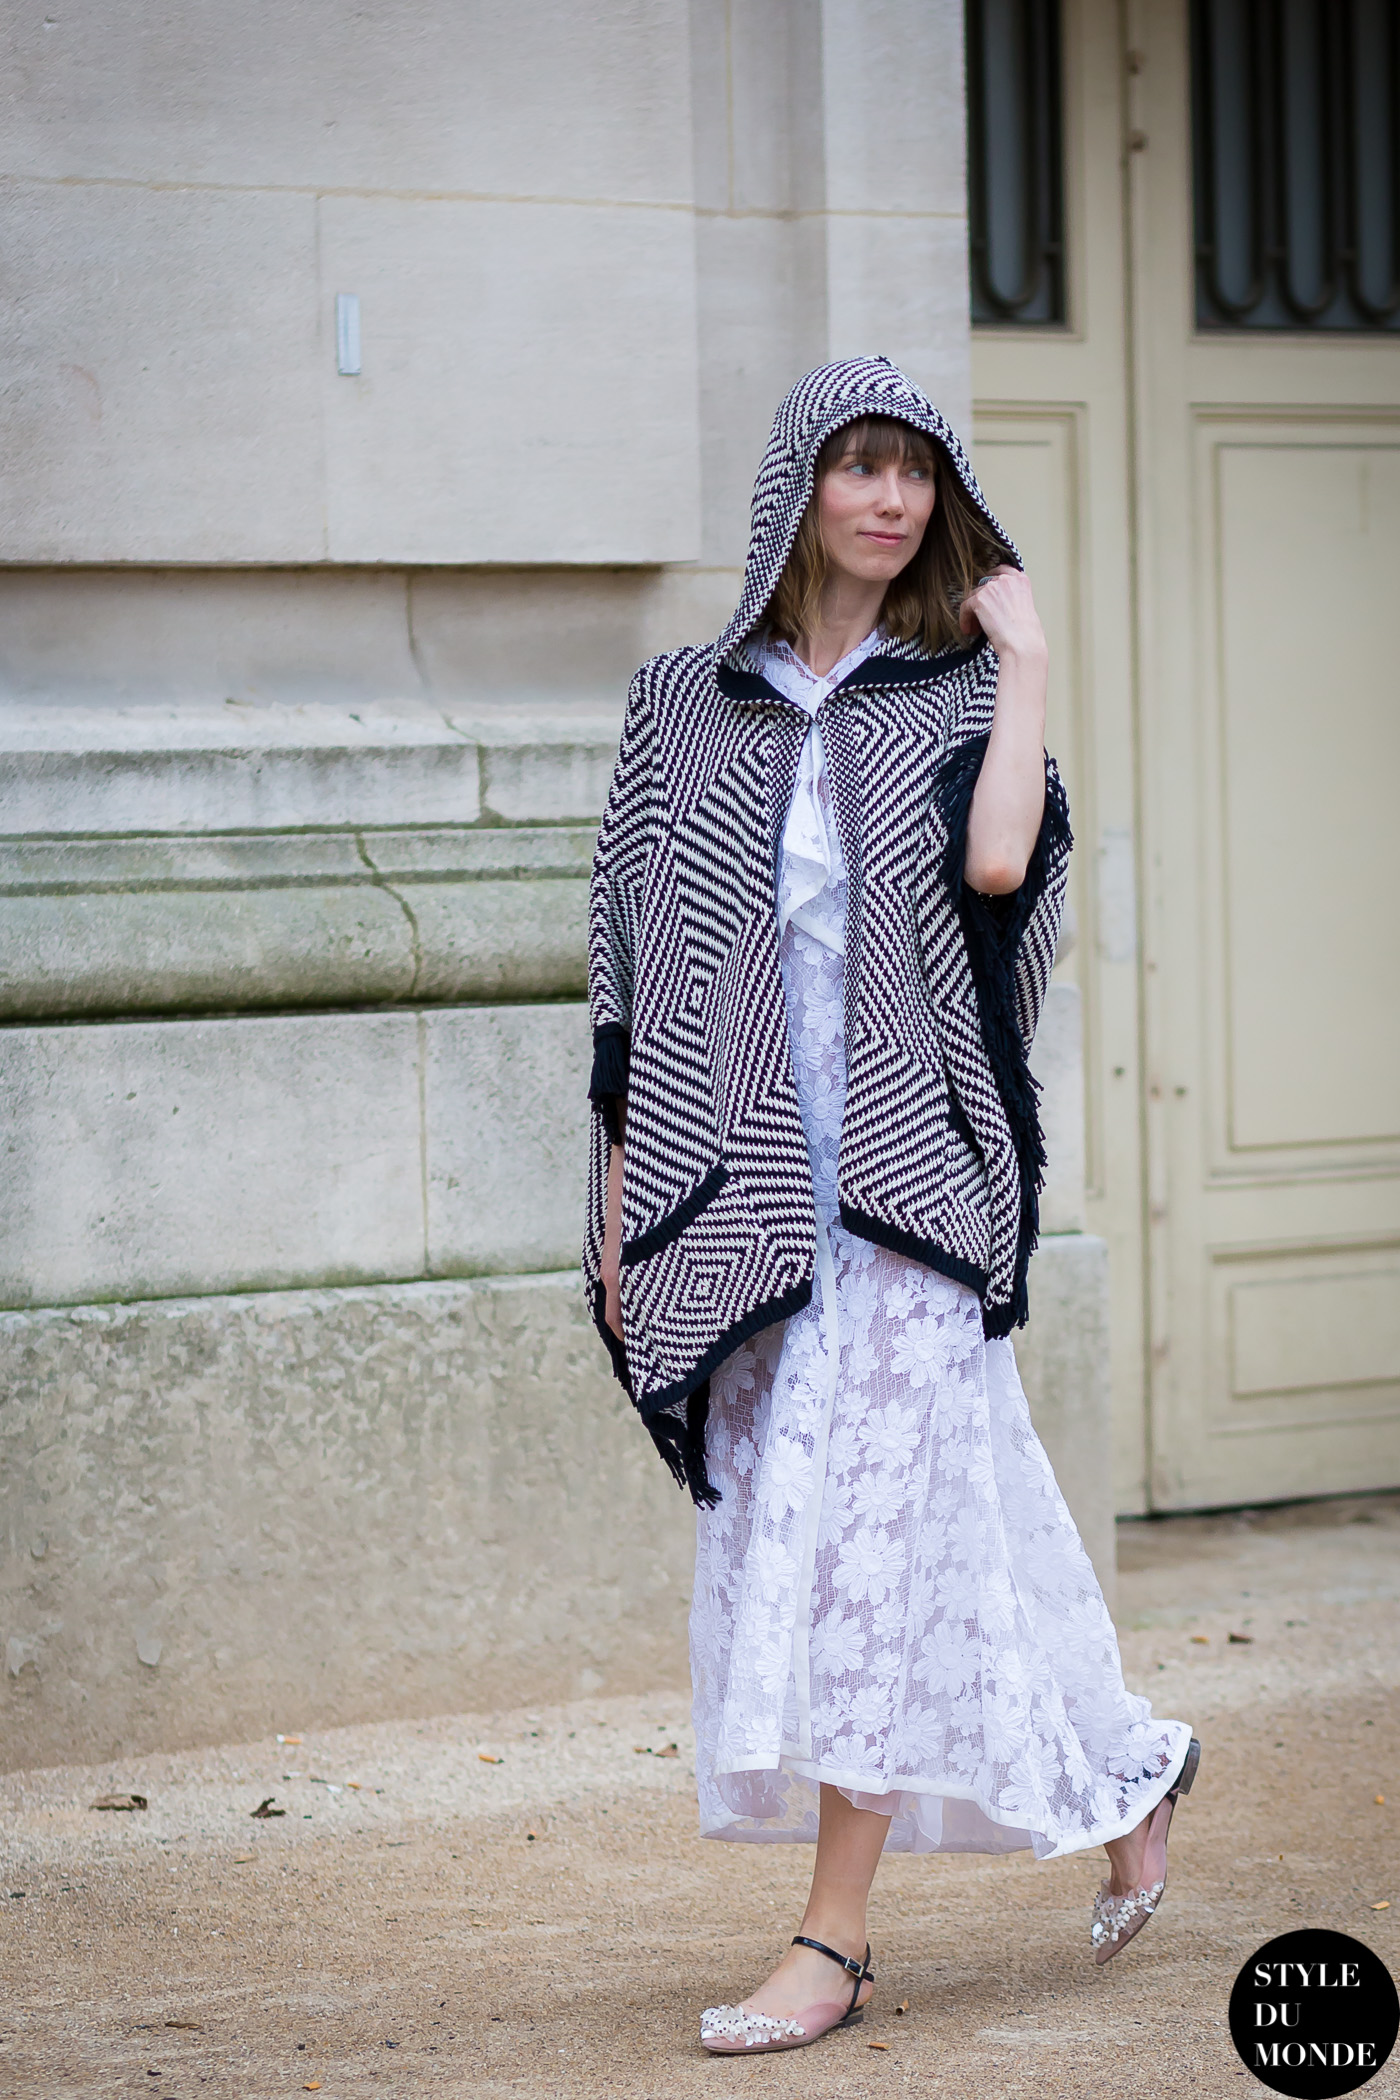 Paris Fashion Week Fw 2015 Street Style Anya Ziourova Style Du Monde Street Style Street